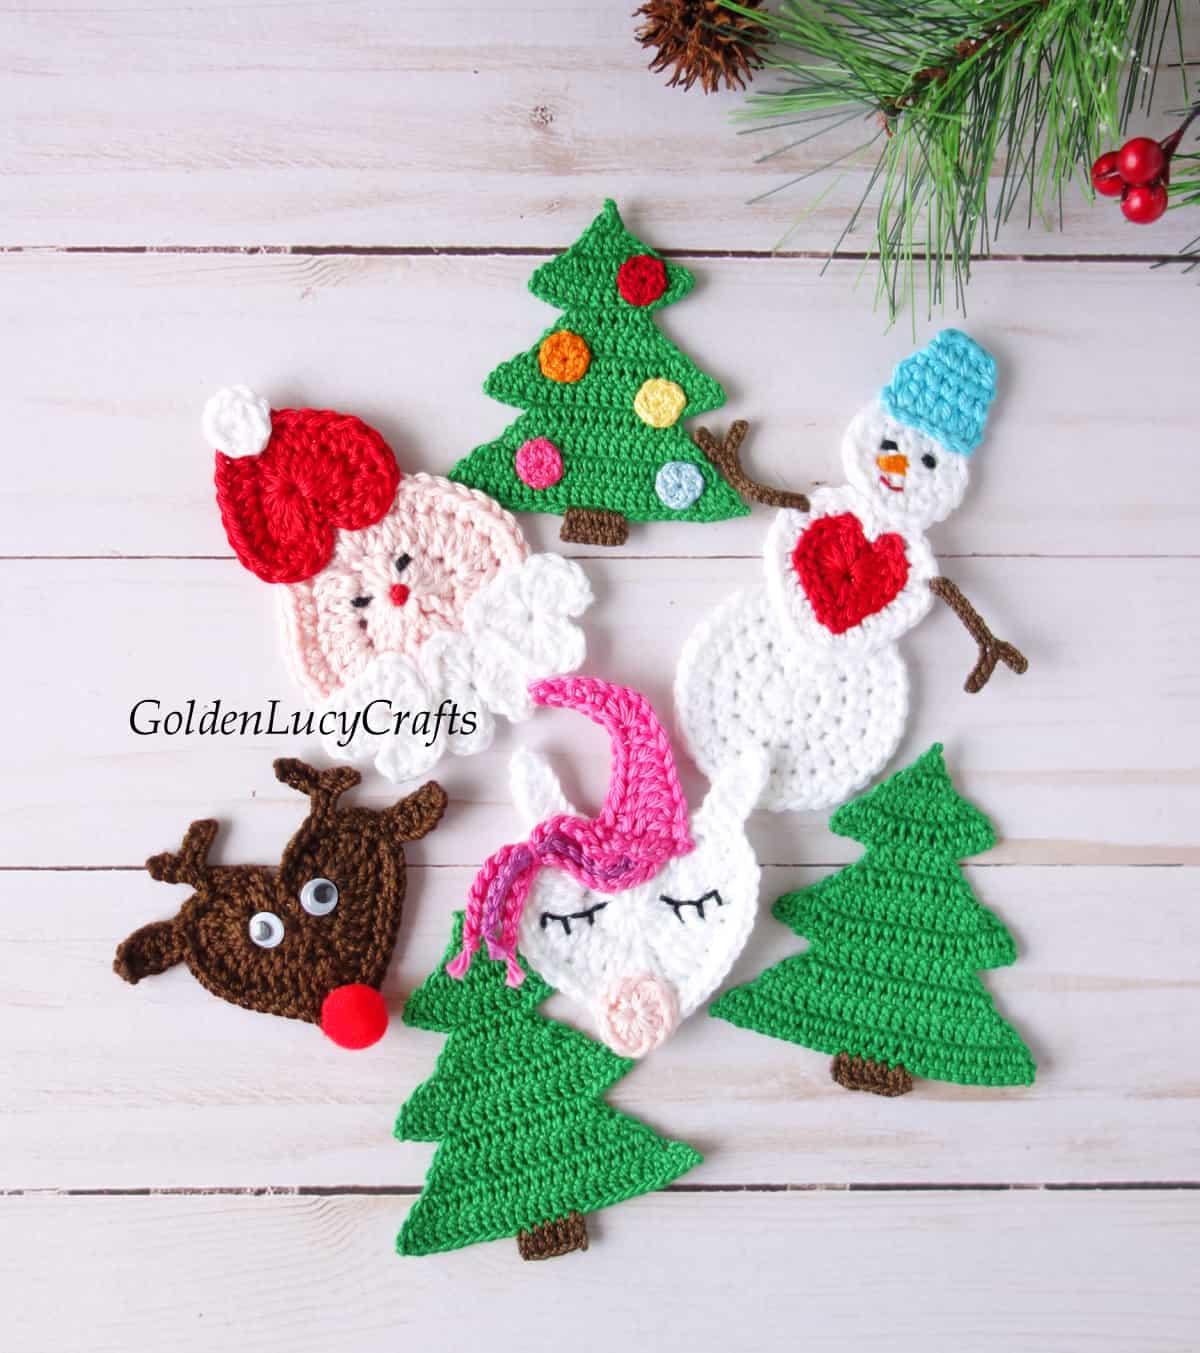 Crochet Christmas appliques - Santa, reindeer, snowman, unicorn, Christmas trees.